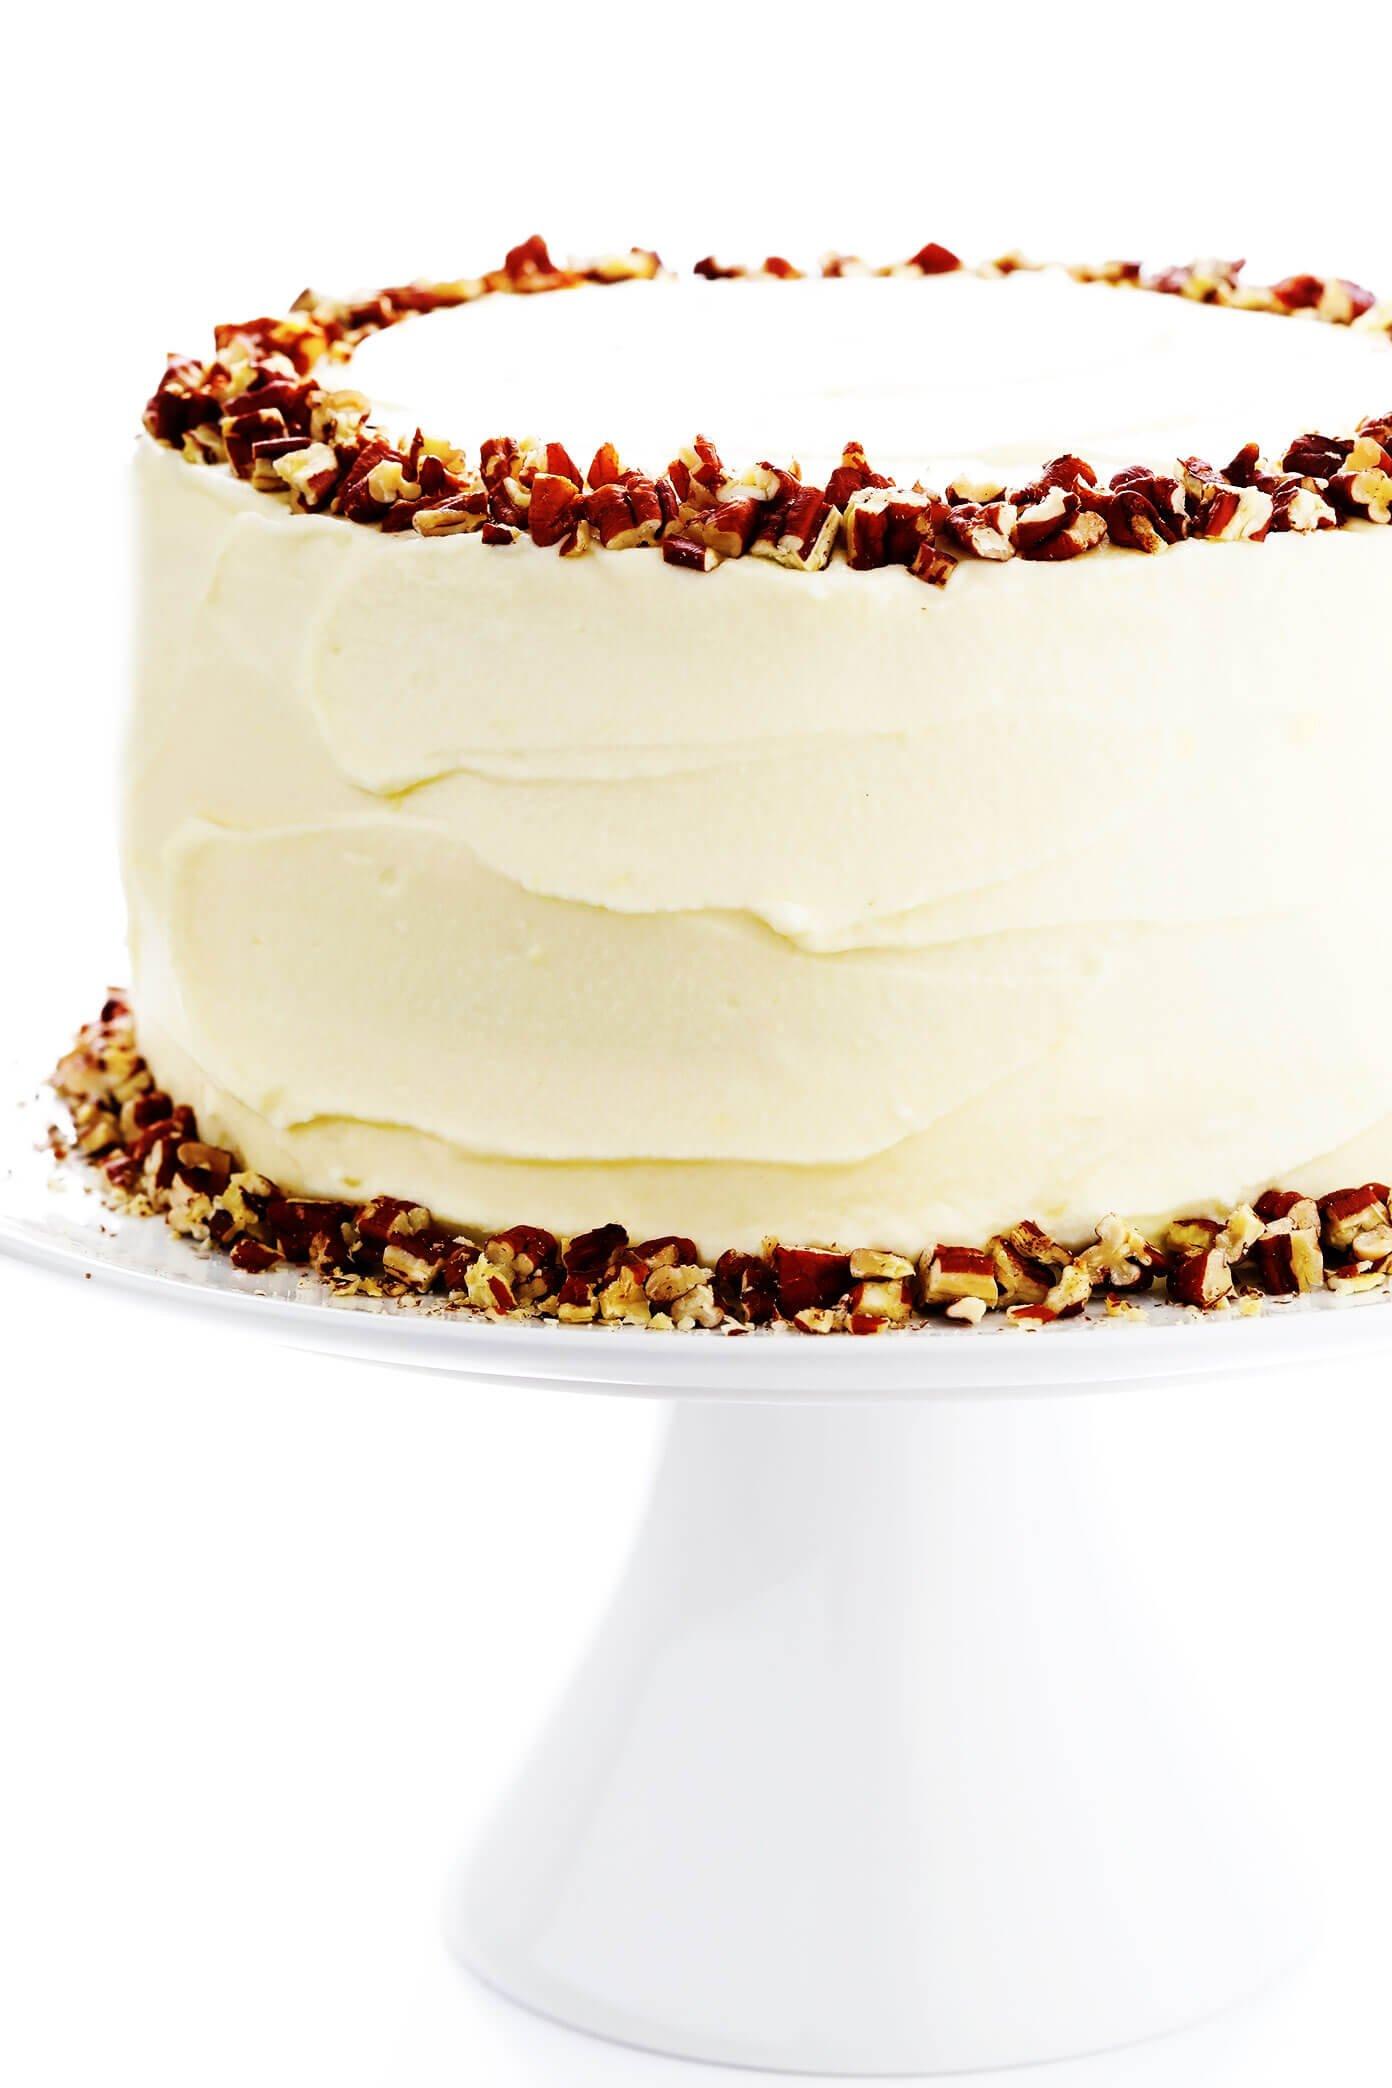 Doctor Bird Cake (Hummingbird Cake) on Pedestal